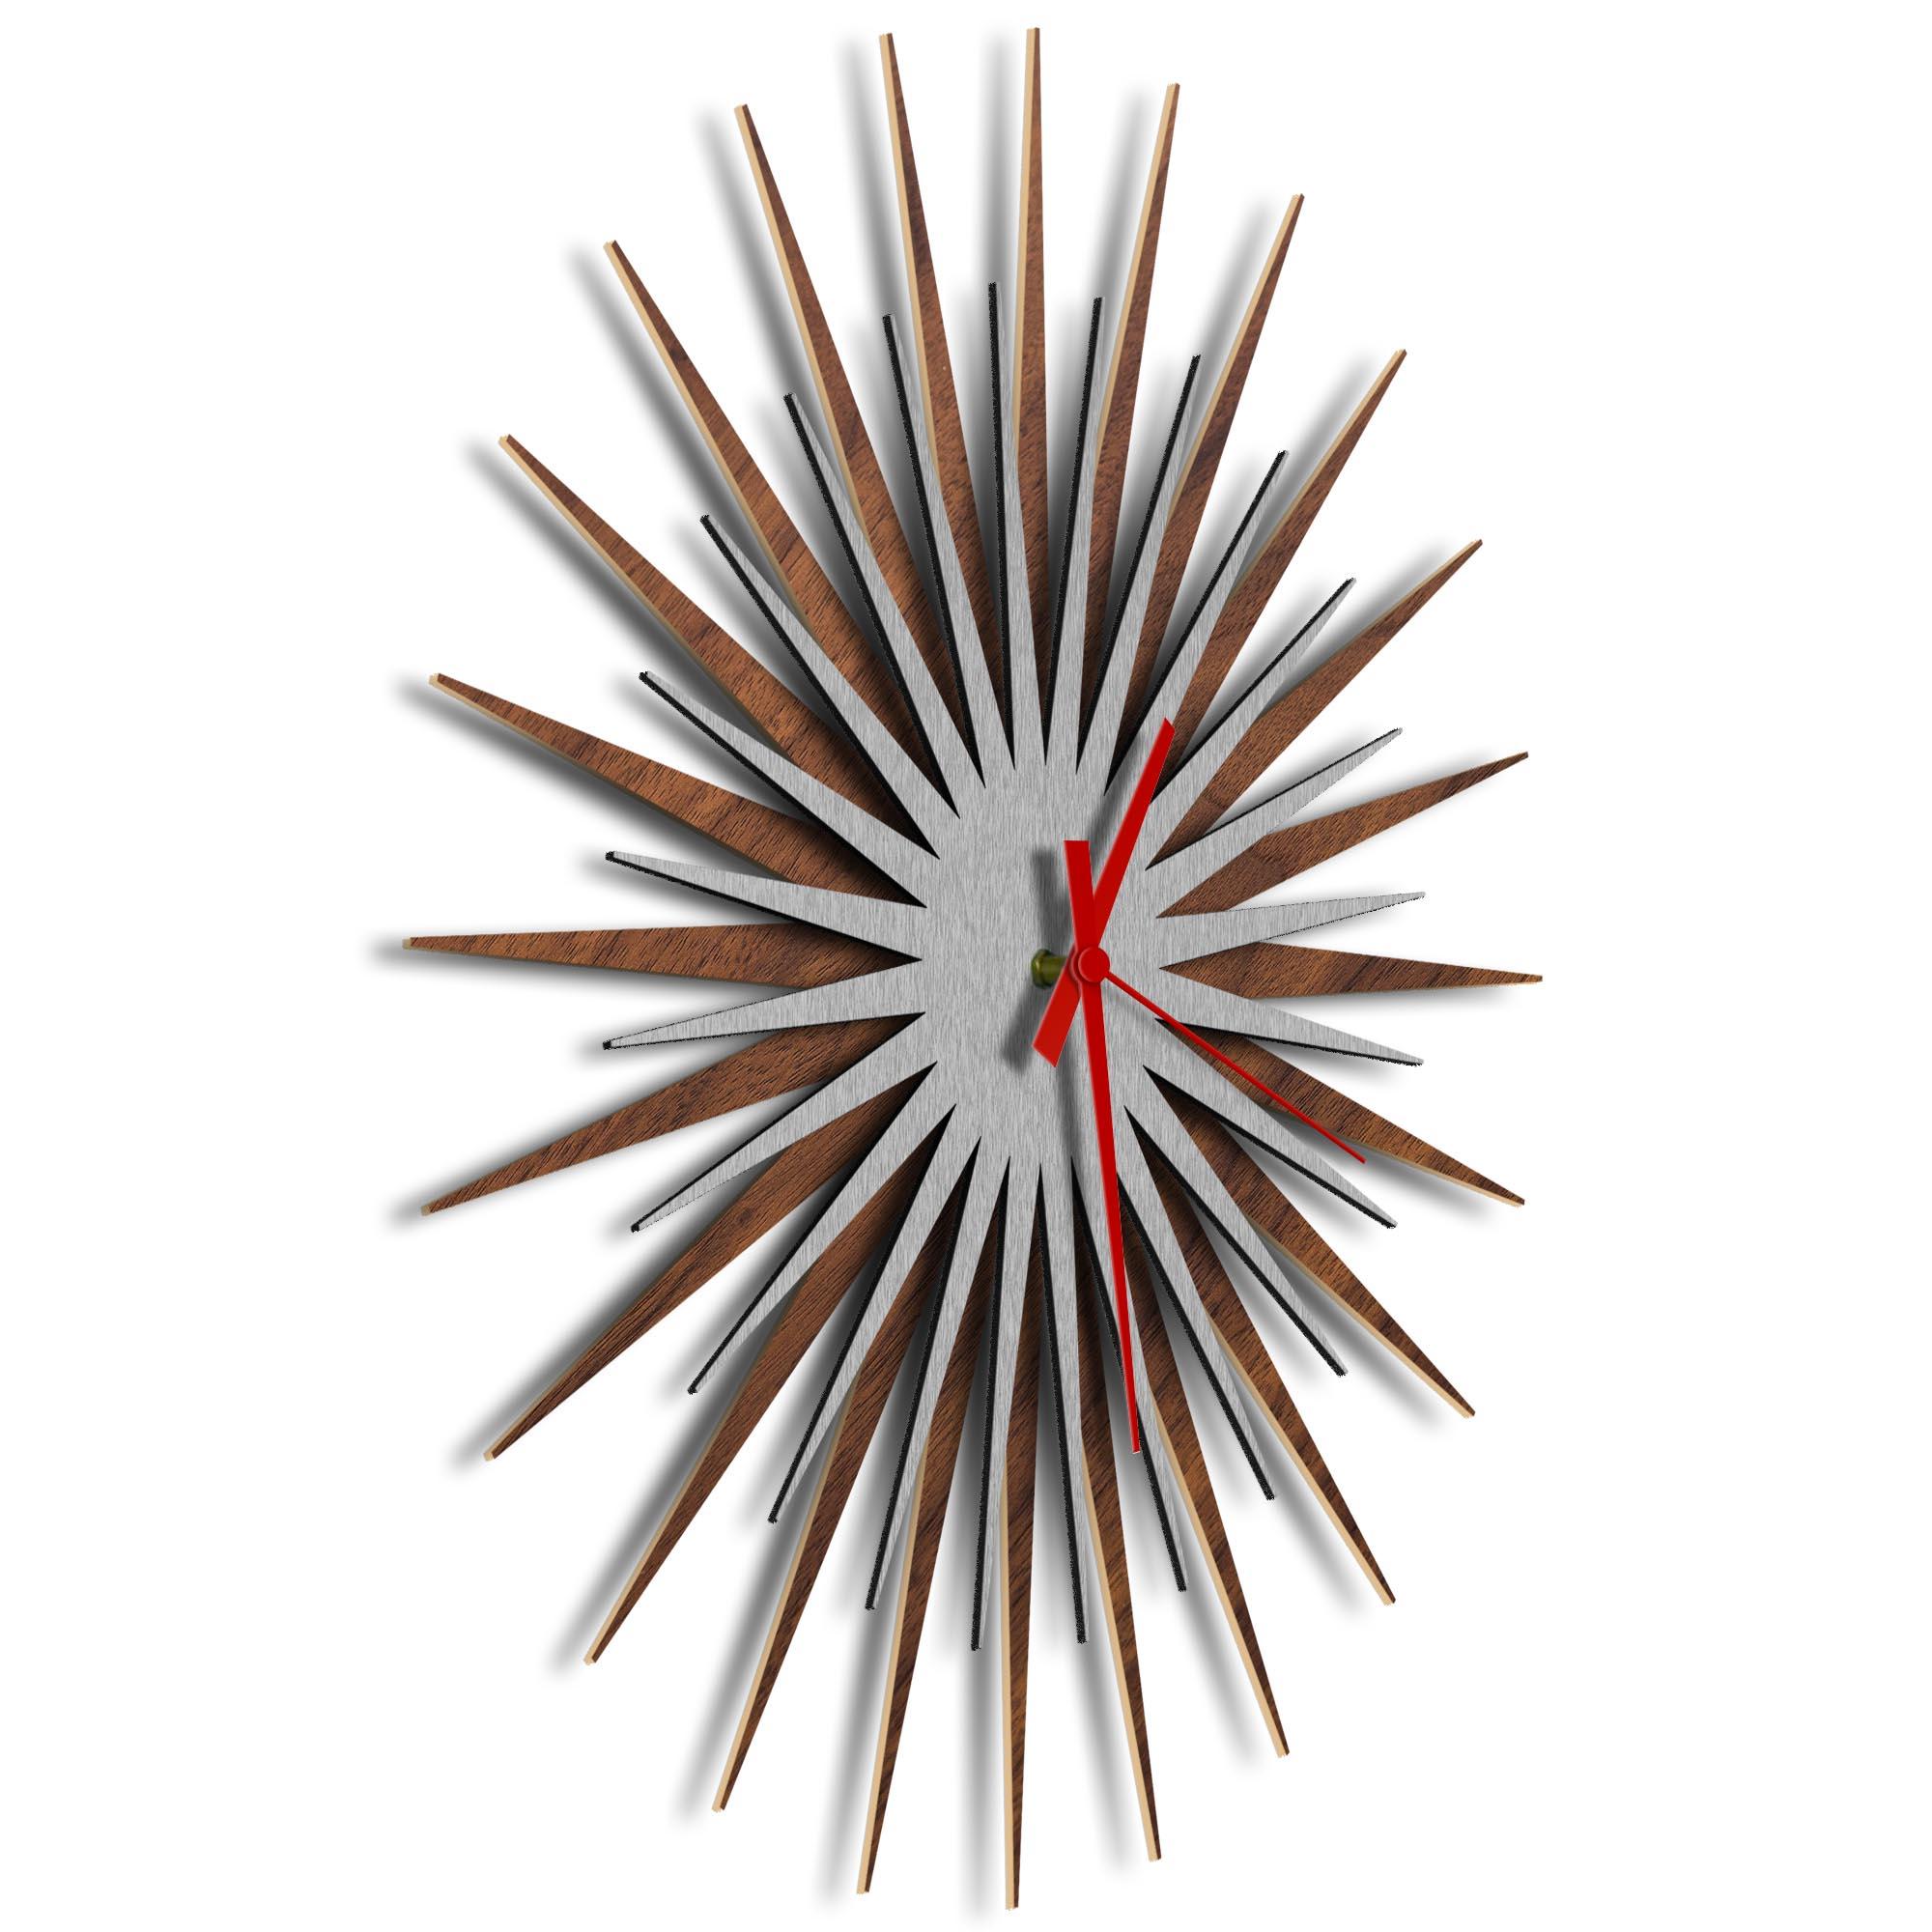 Atomic Era Clock Walnut Silver Red by Adam Schwoeppe - Mid-Century Modern Clock on Brushed Walnut Polymetal - Image 2